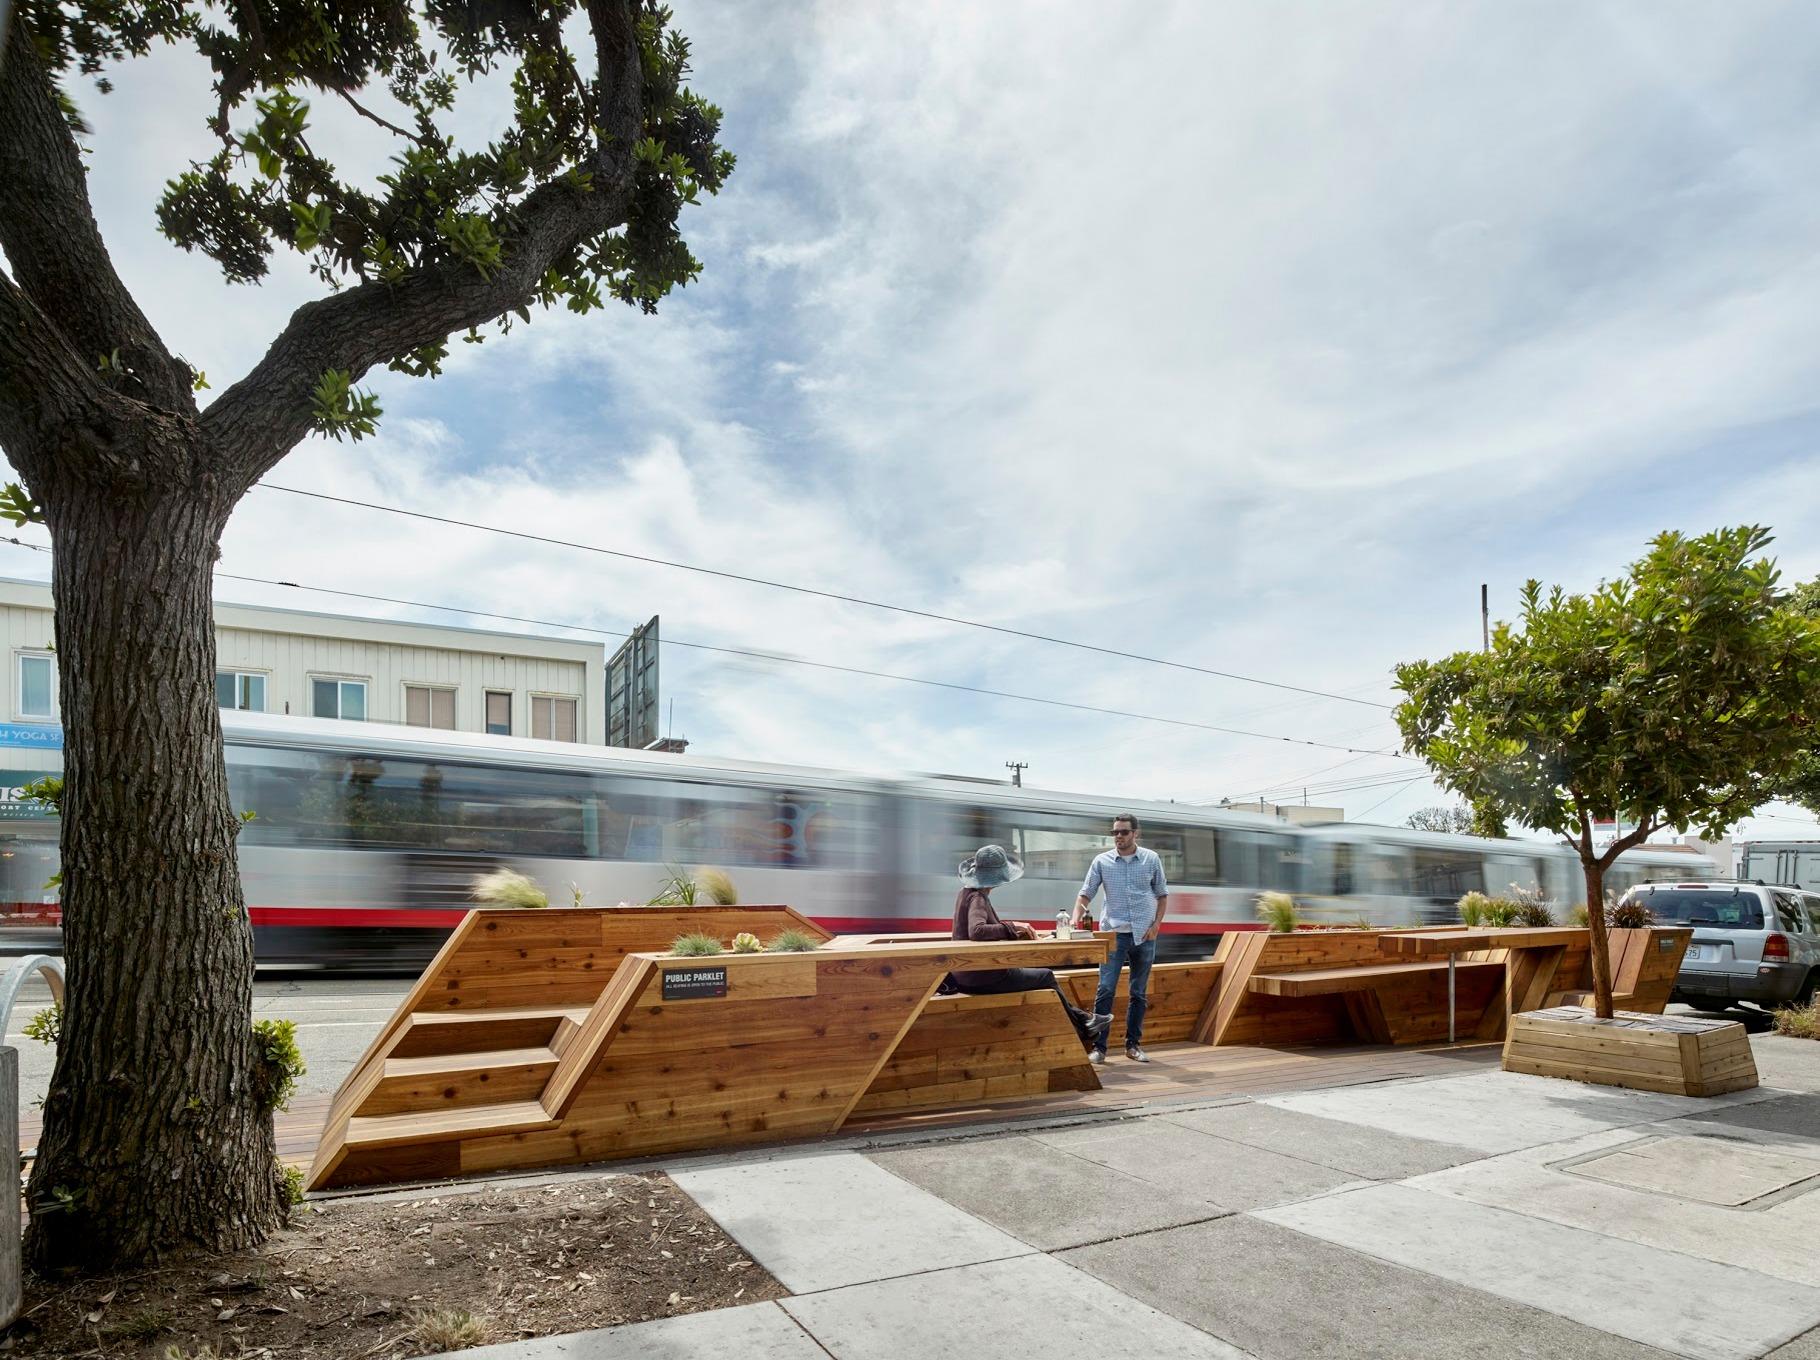 Sunset Parklet, una plazoleta diseñada por INTERSTICE Architects